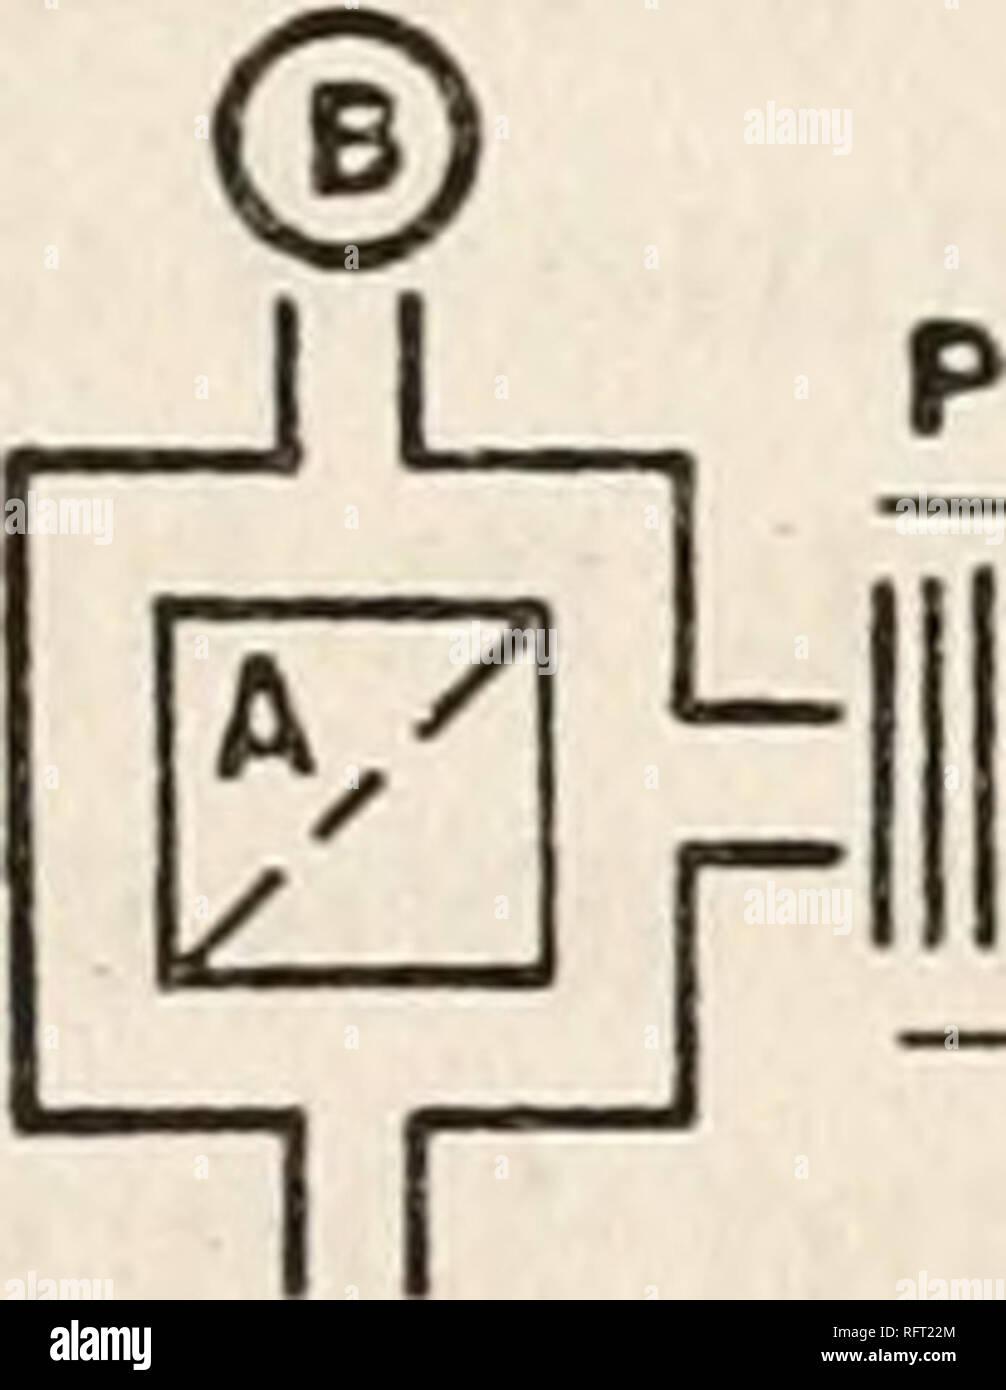 carnegie institution of washington publication  phosphorescence spectra  57  plish this without changing any